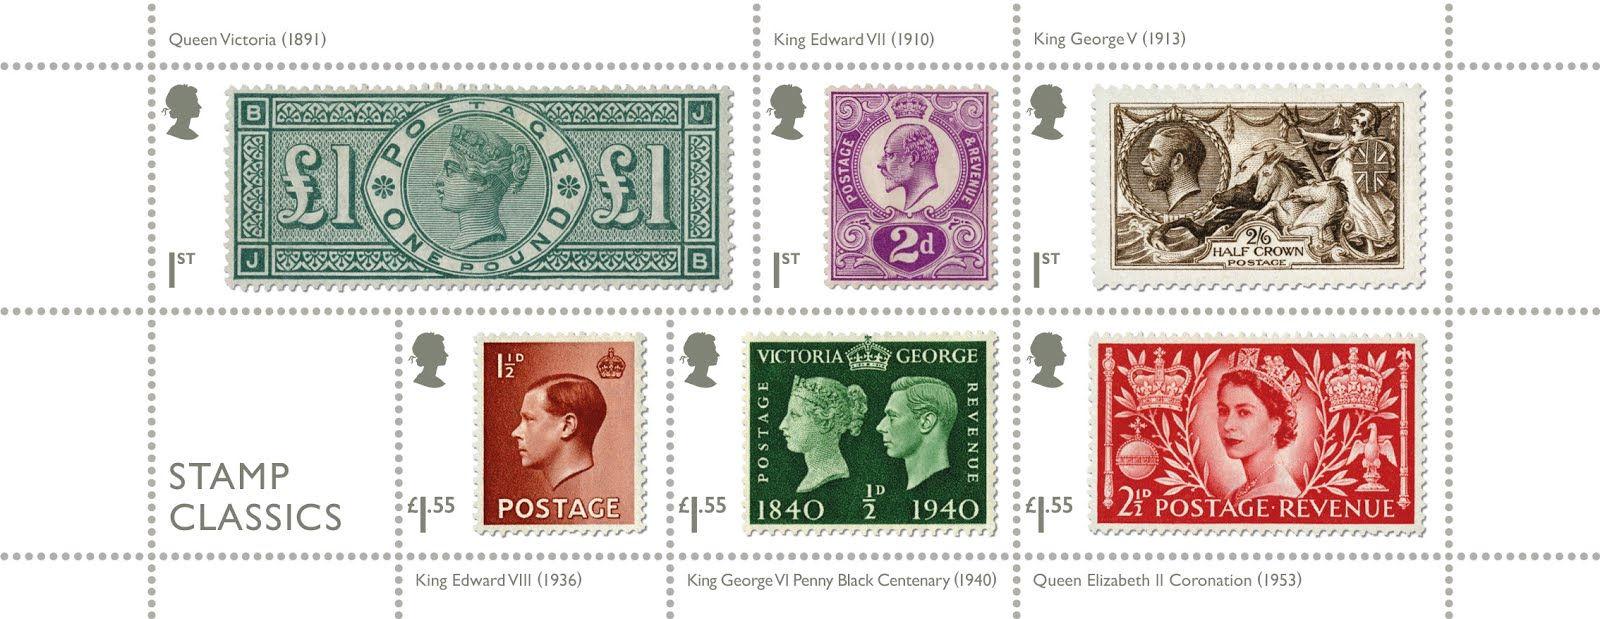 Great Britain - Stamp Classics (January 15, 2019) miniature sheet of 6